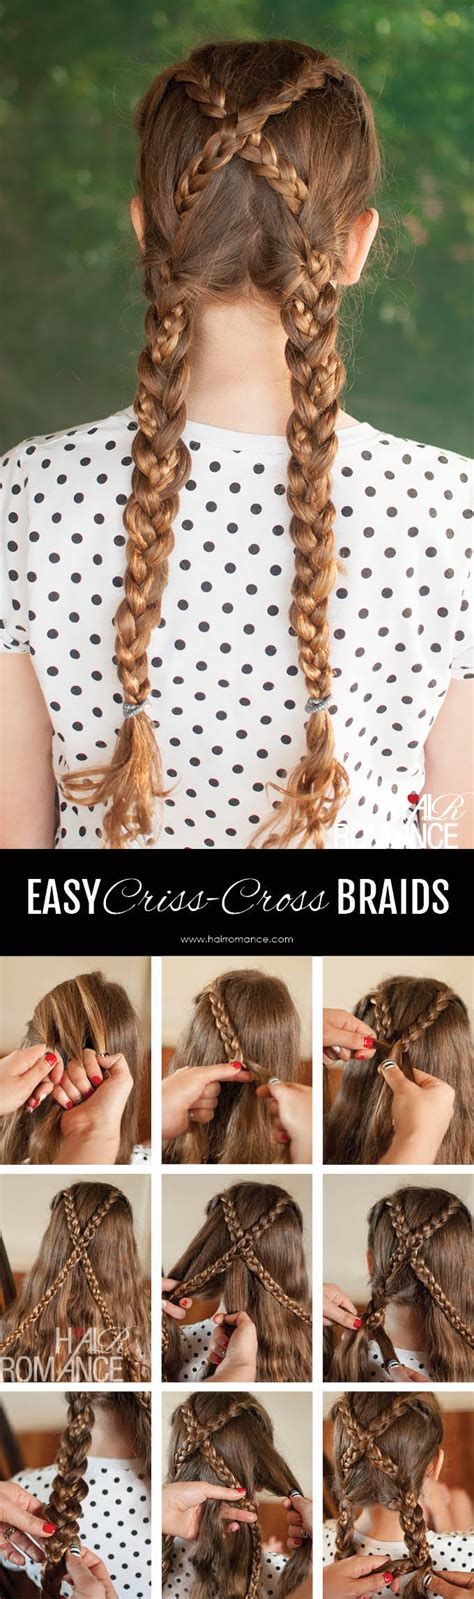 back to school hairstyles australia back to school hairstyles criss cross braids tutorial